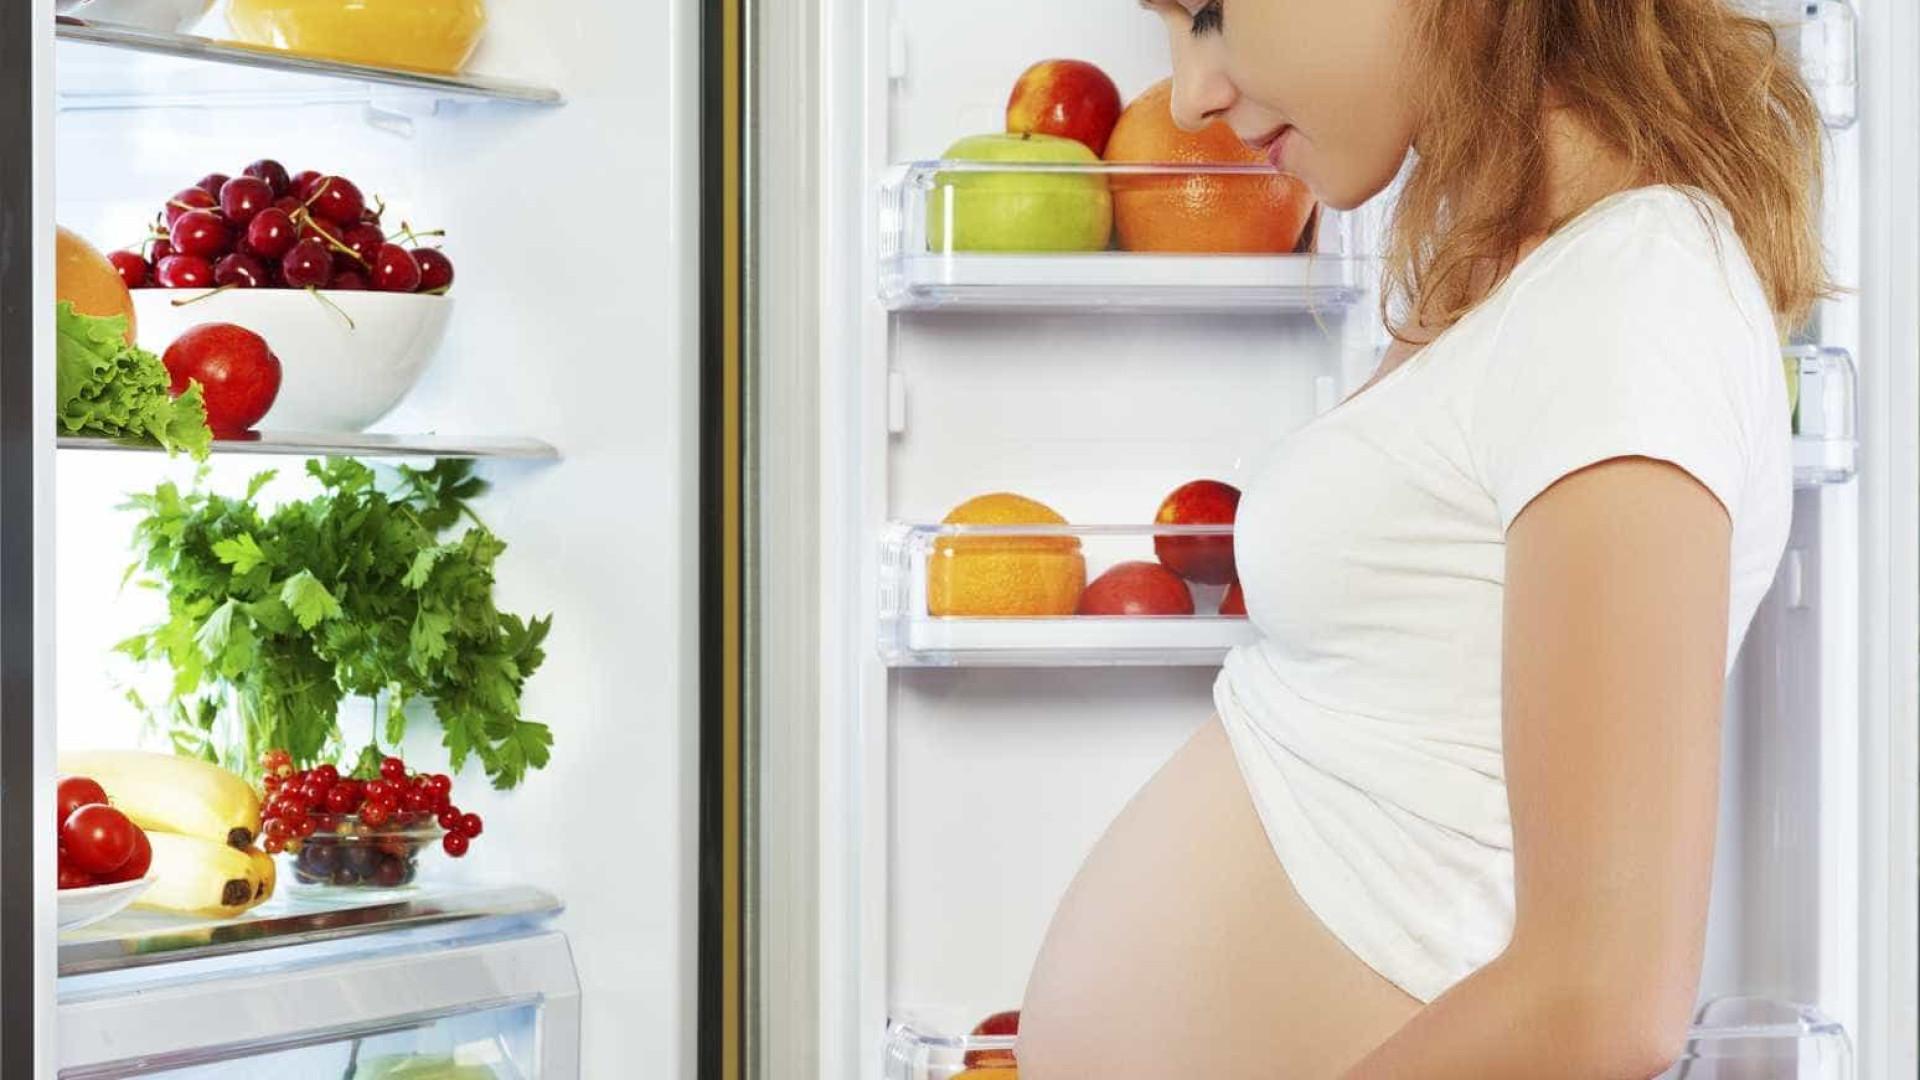 Mitos e verdades da dieta vegana na gravidez